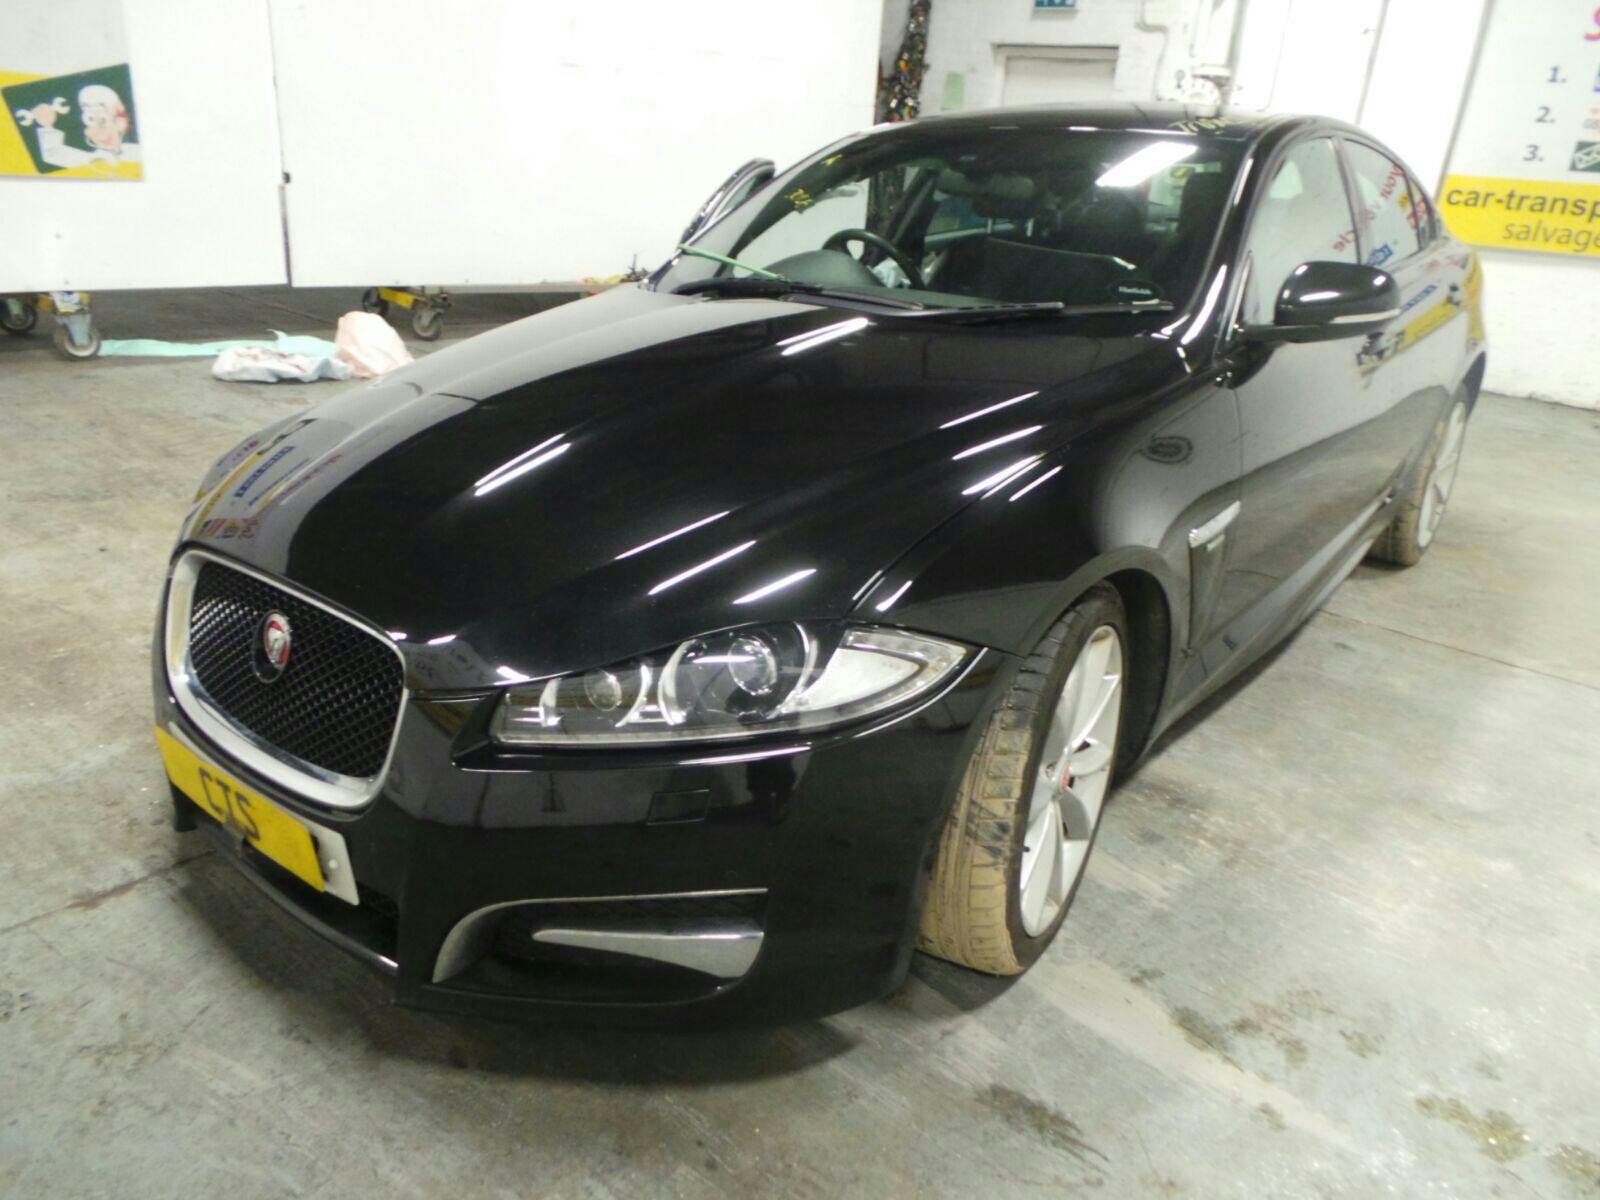 Auctions Car Transplants Co Uk